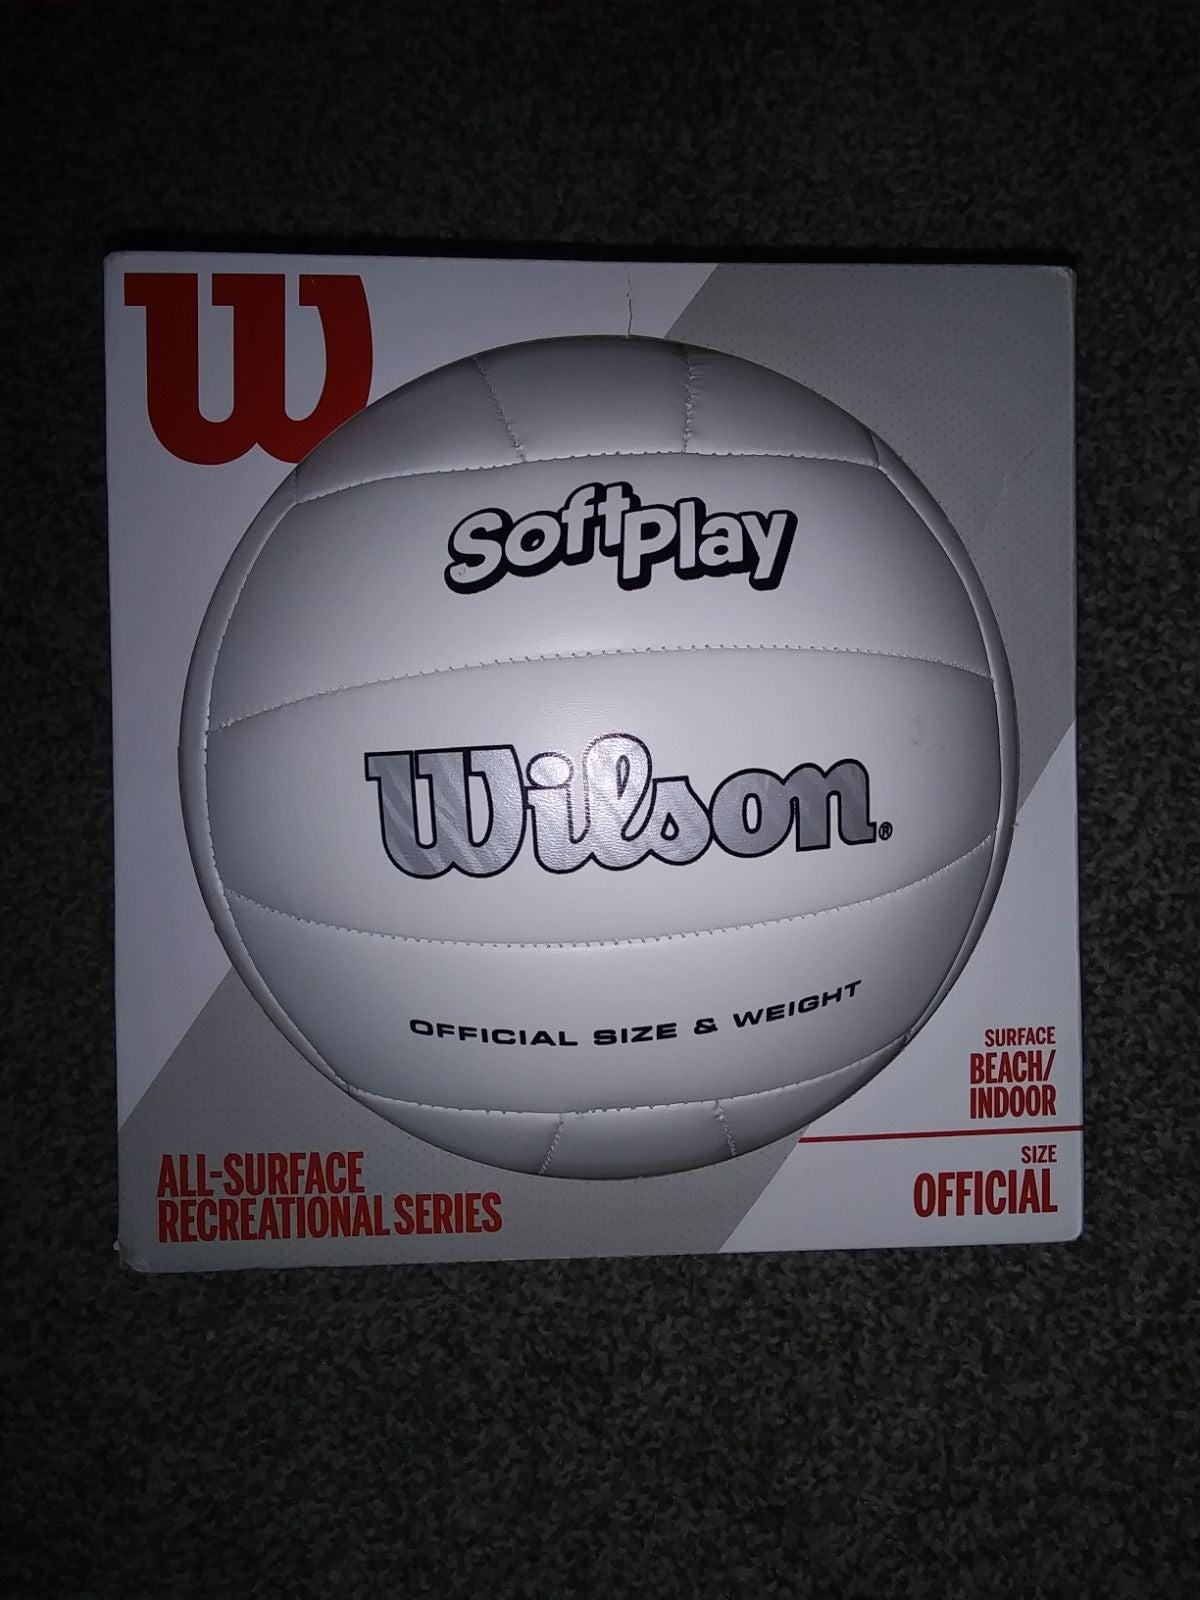 Wilson Volleyball ball